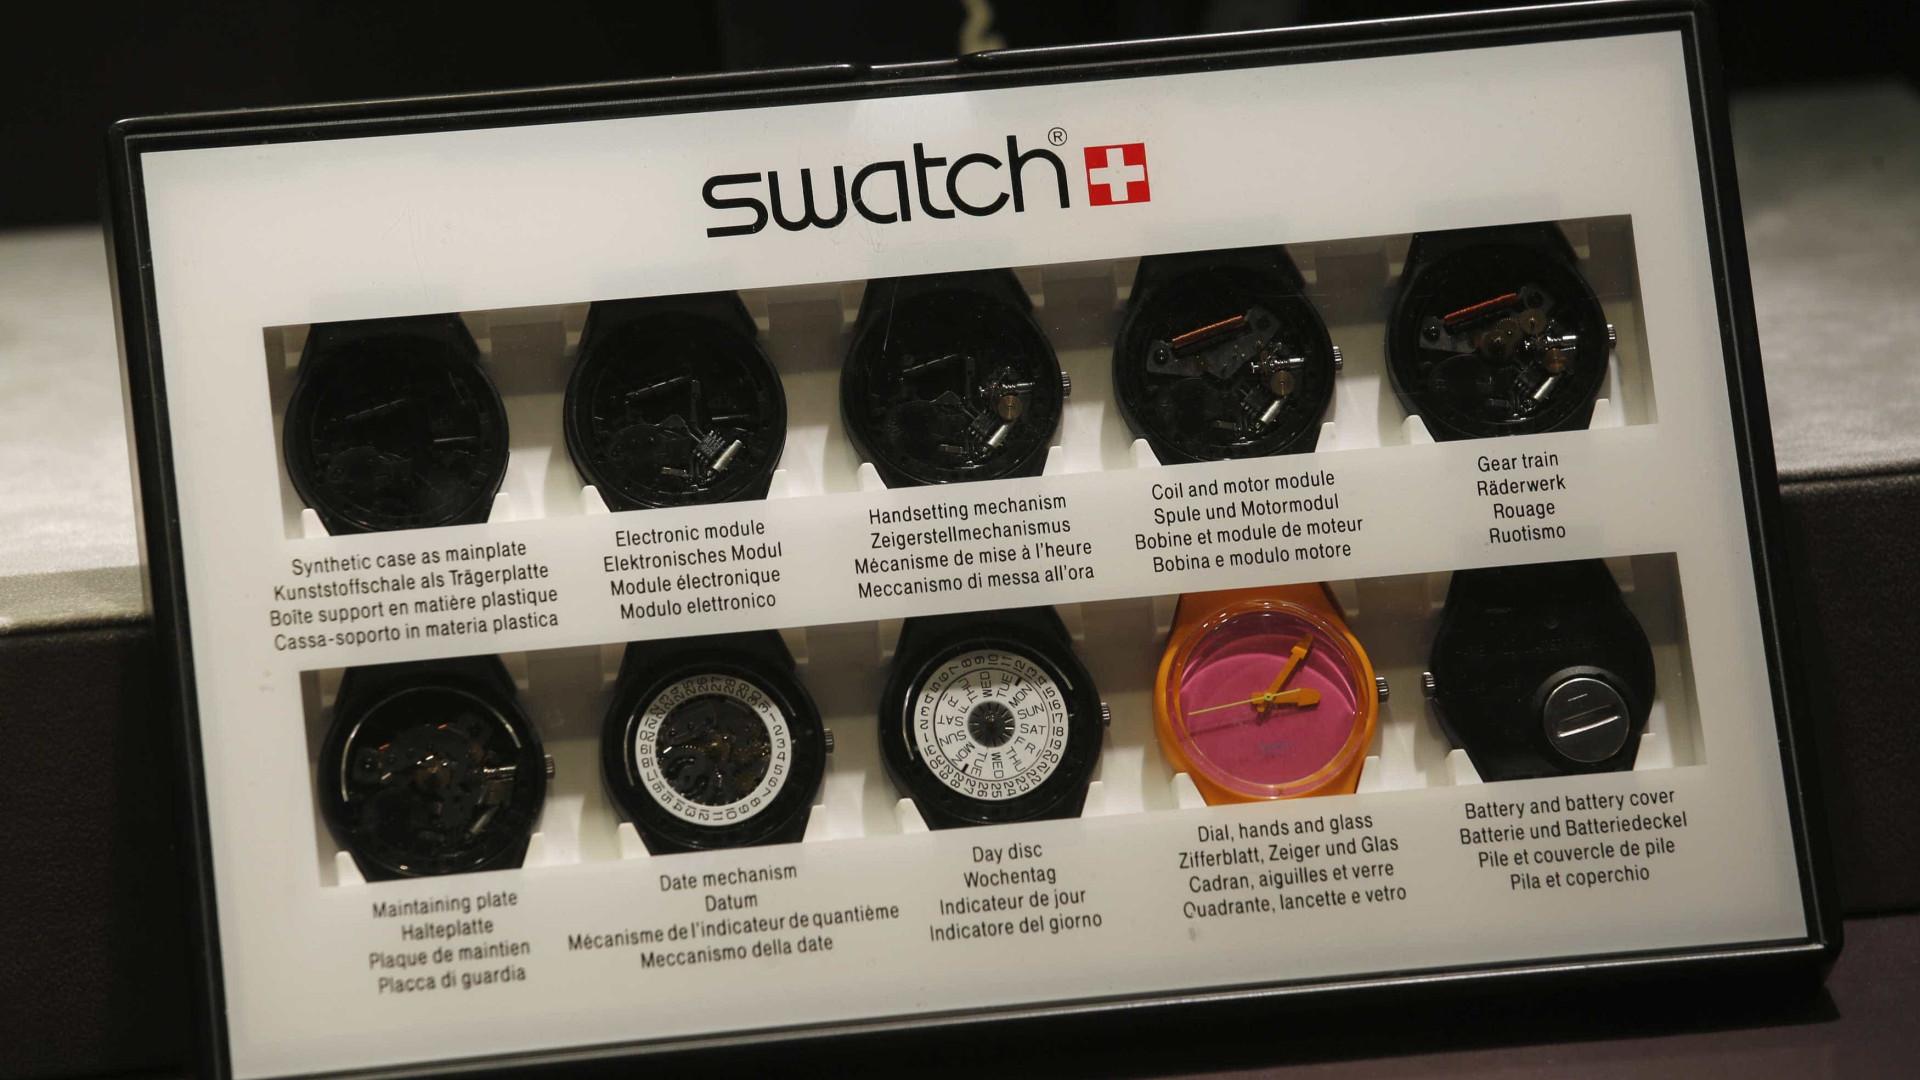 Relógio inteligente da Swatch já tem data prevista